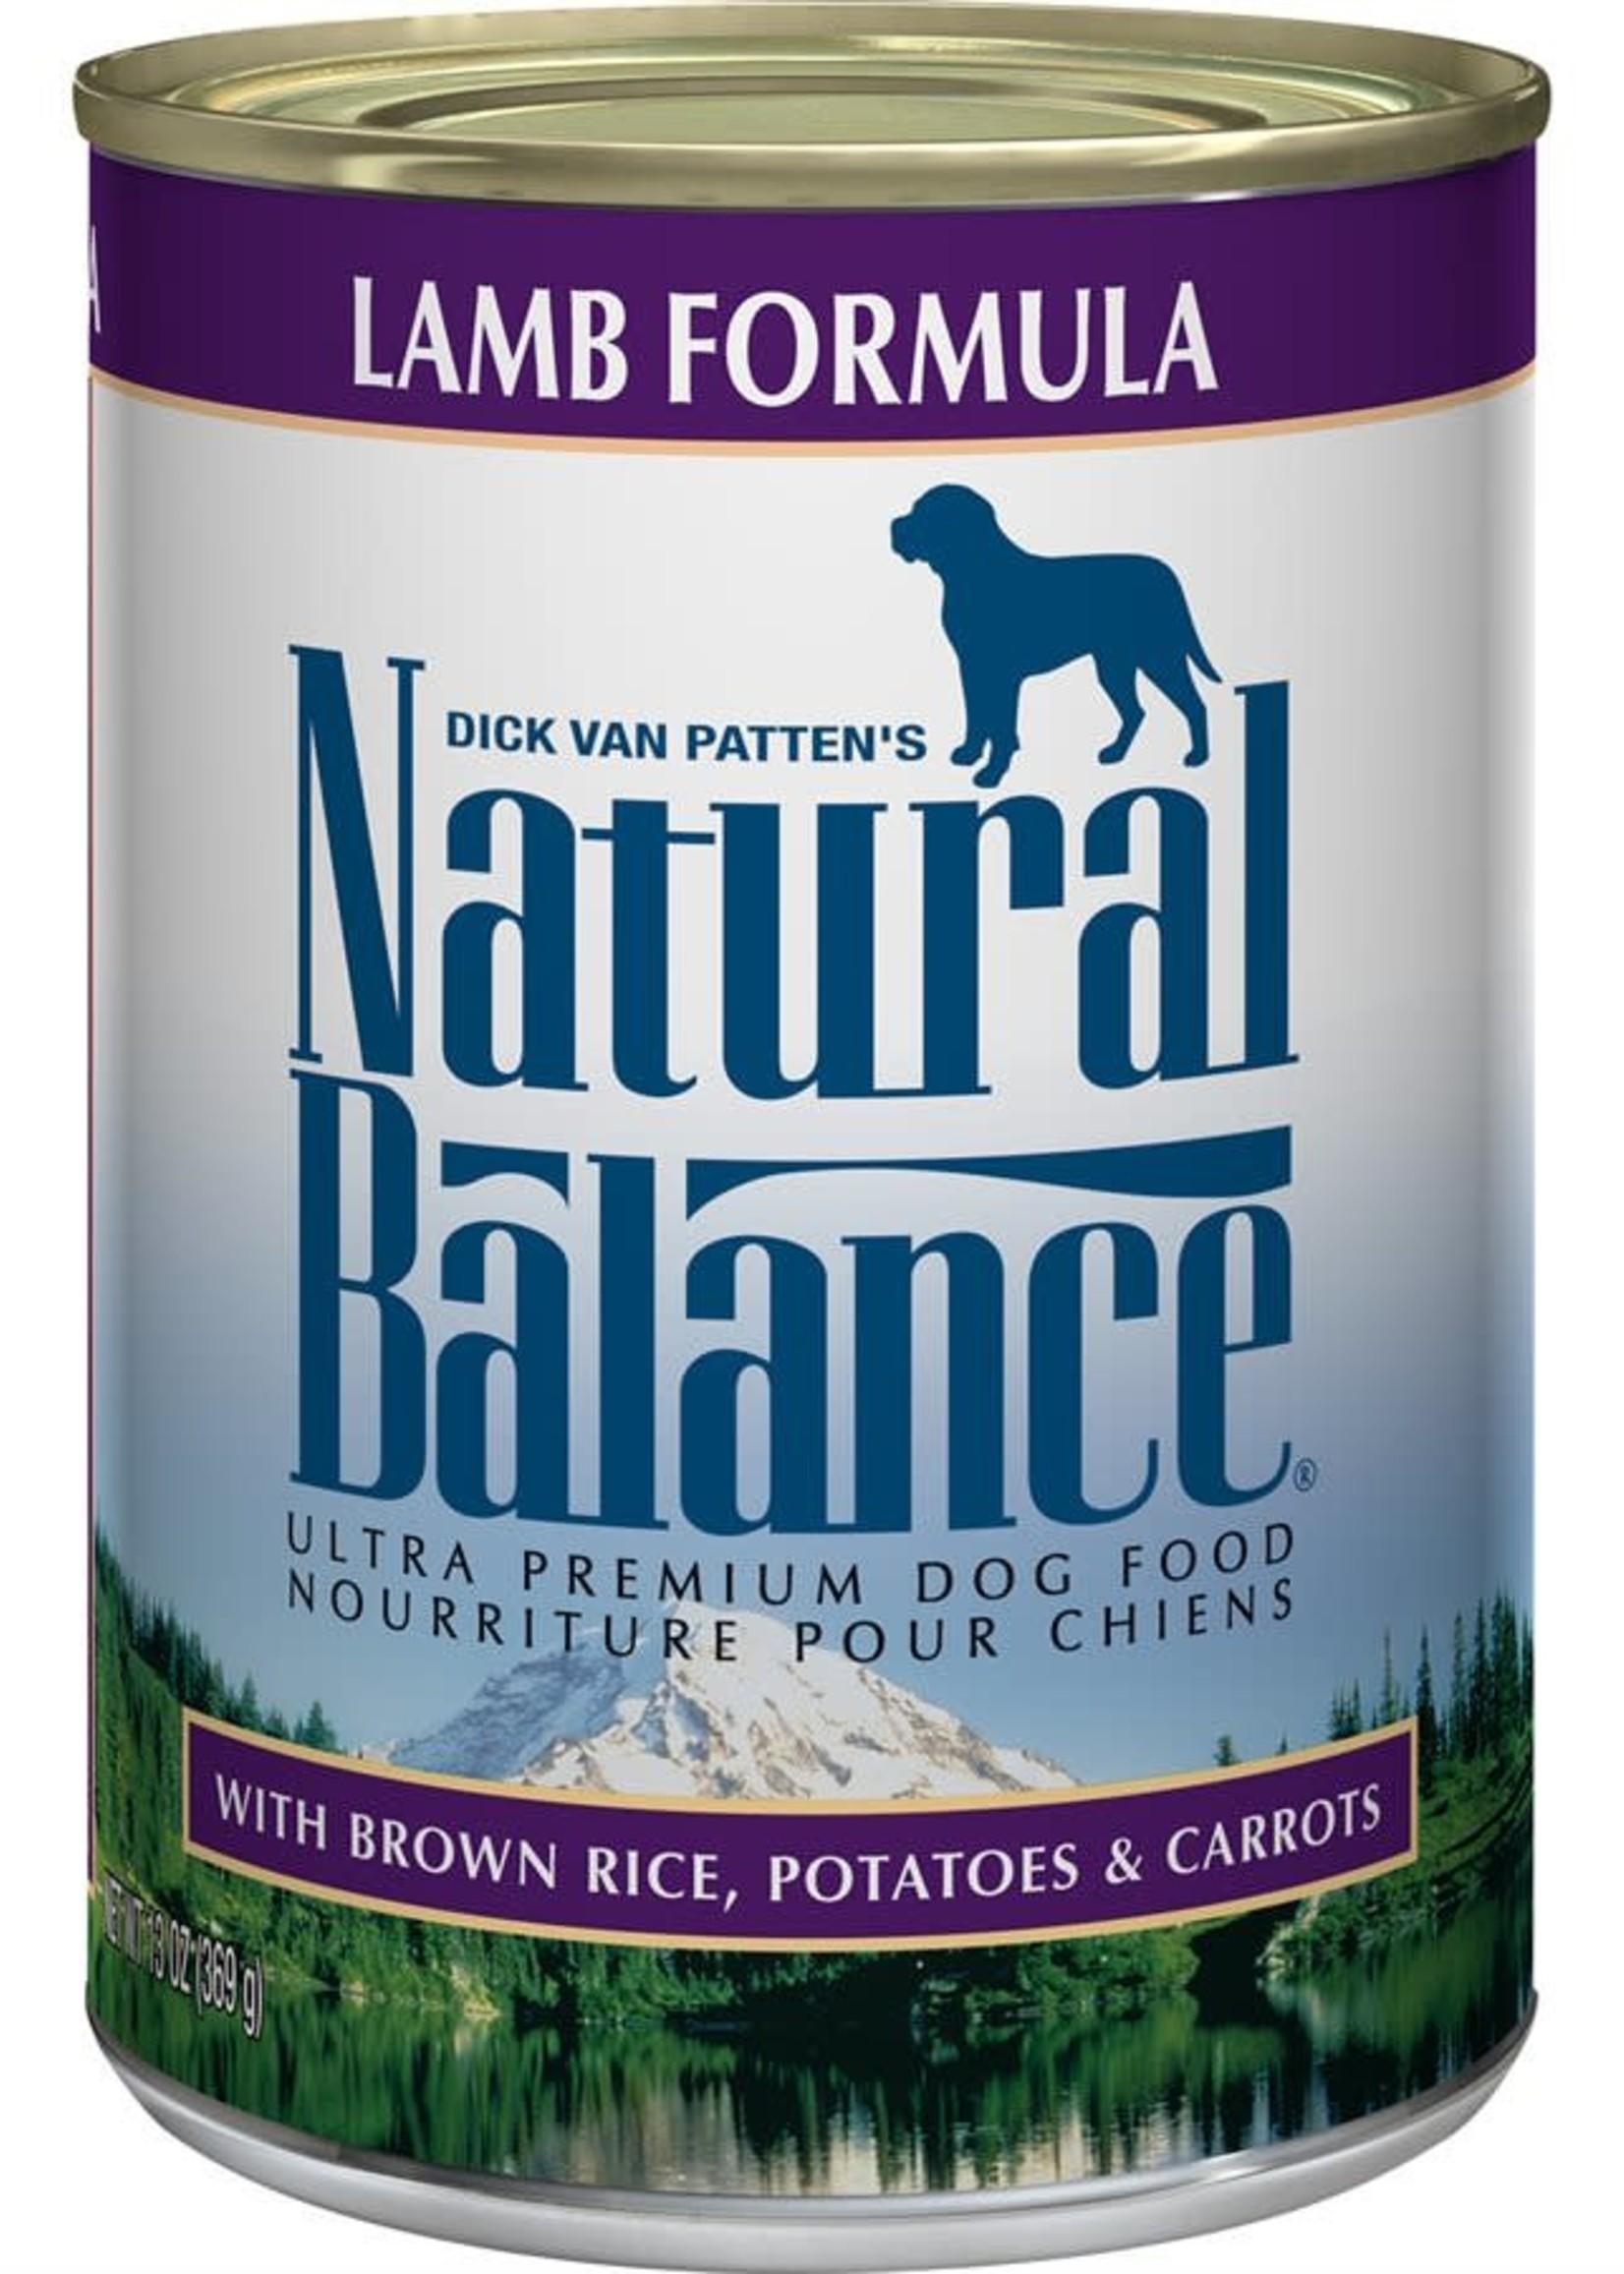 Natural Balance® Natural Balance Ultra Premium Lamb Formula with Brown Rice, Potatoes & Carrots 13oz